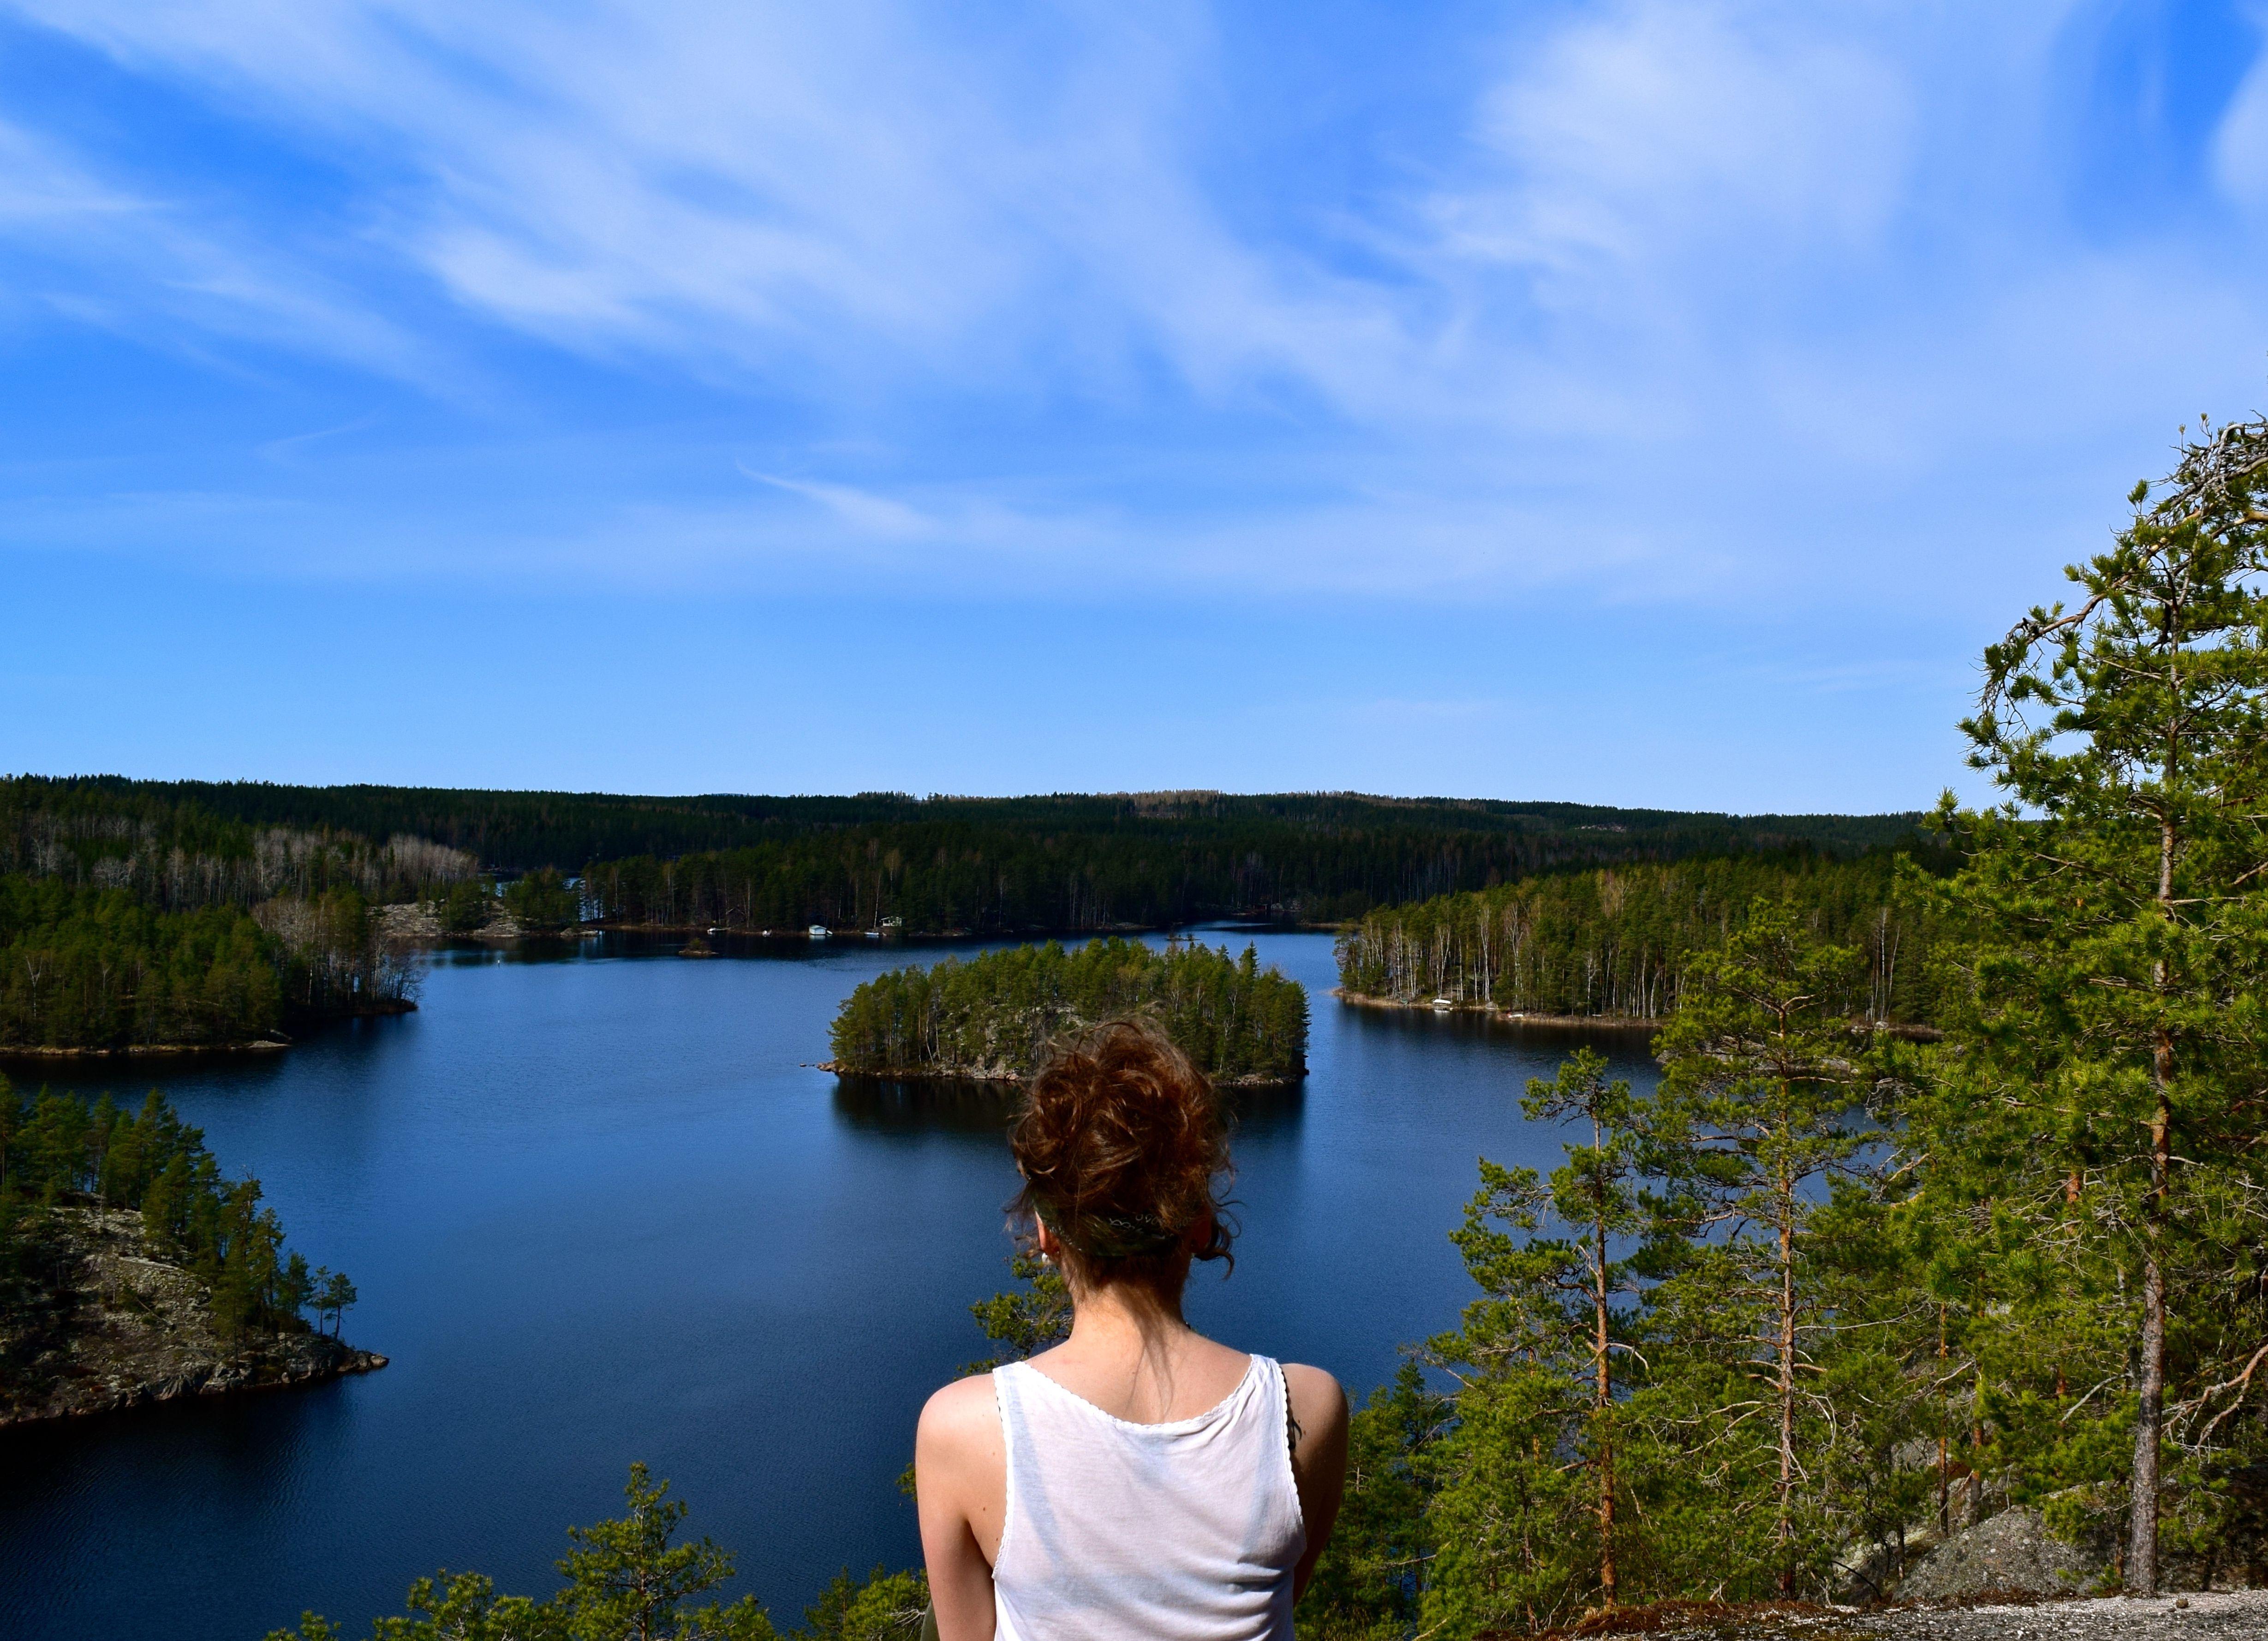 Repovesi National park, Finland - April 2014